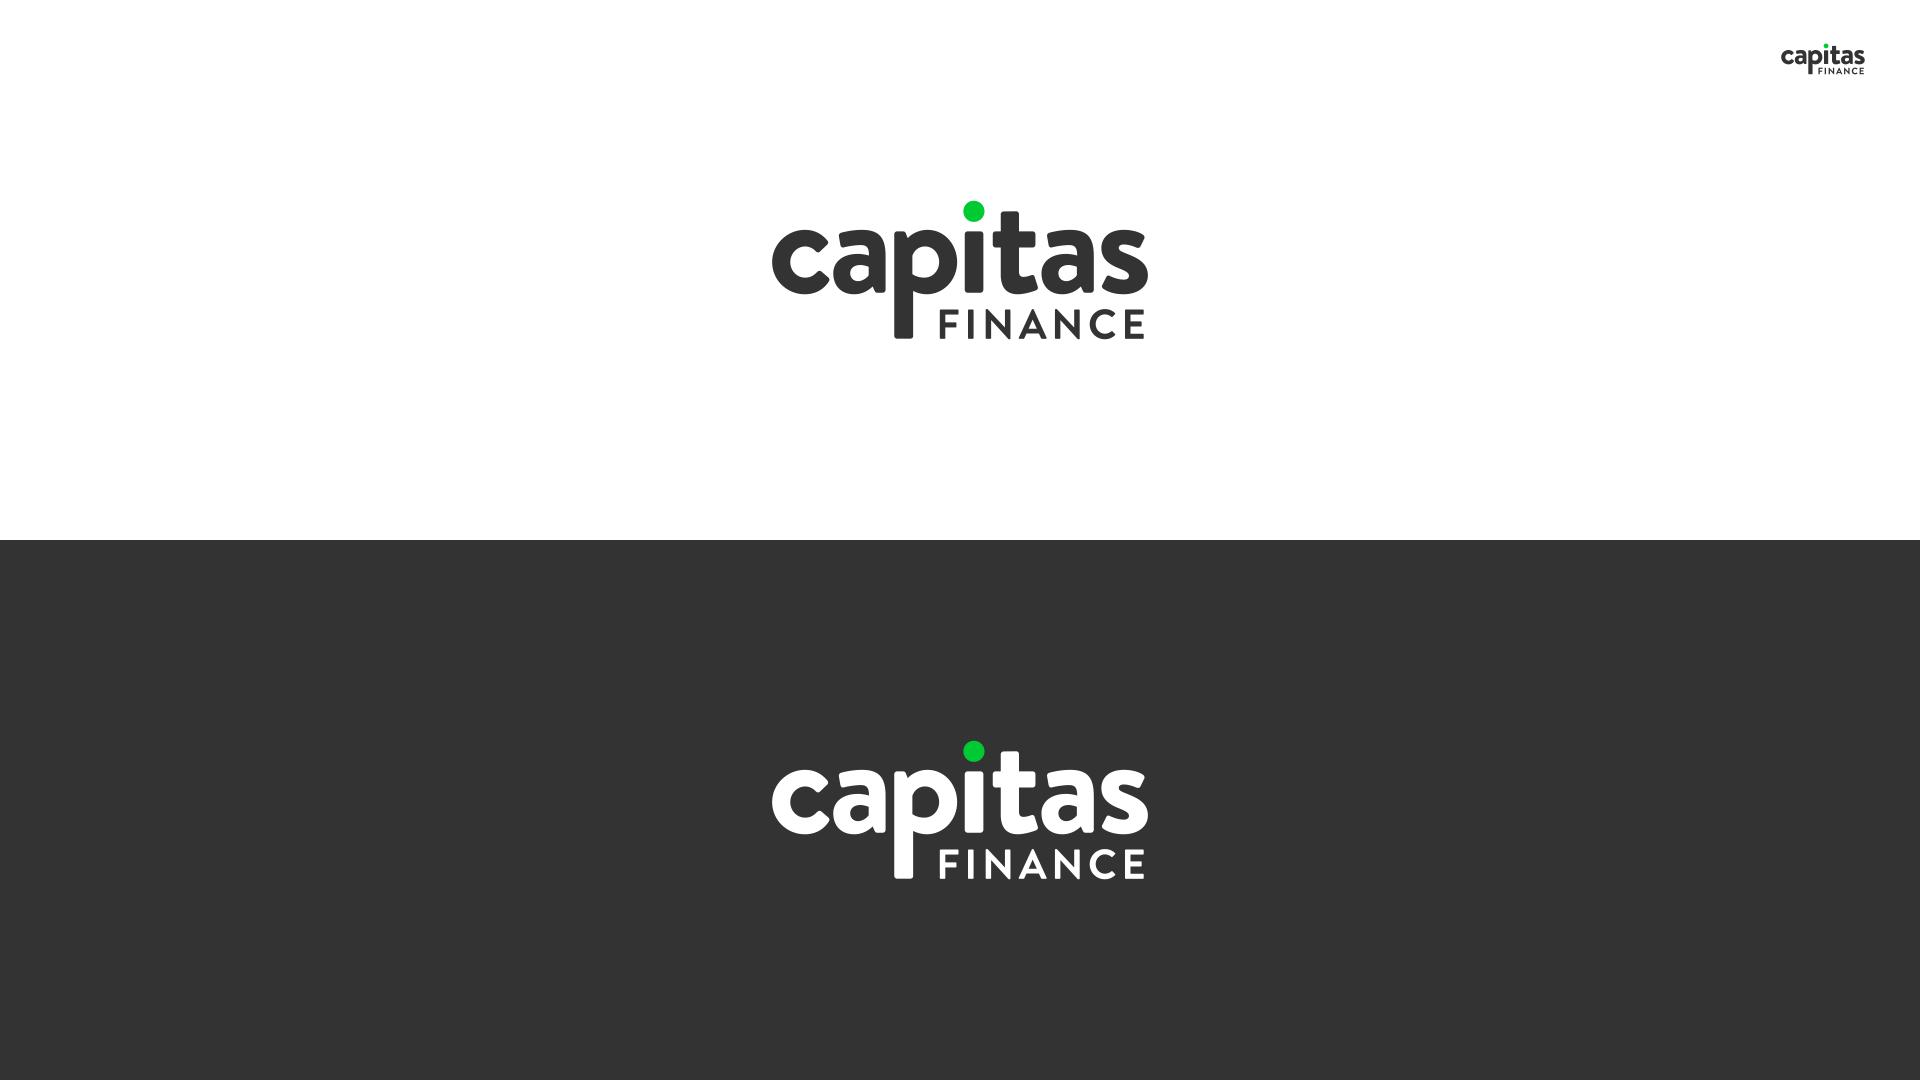 Capitas Finance Brand Presentation - The Logo